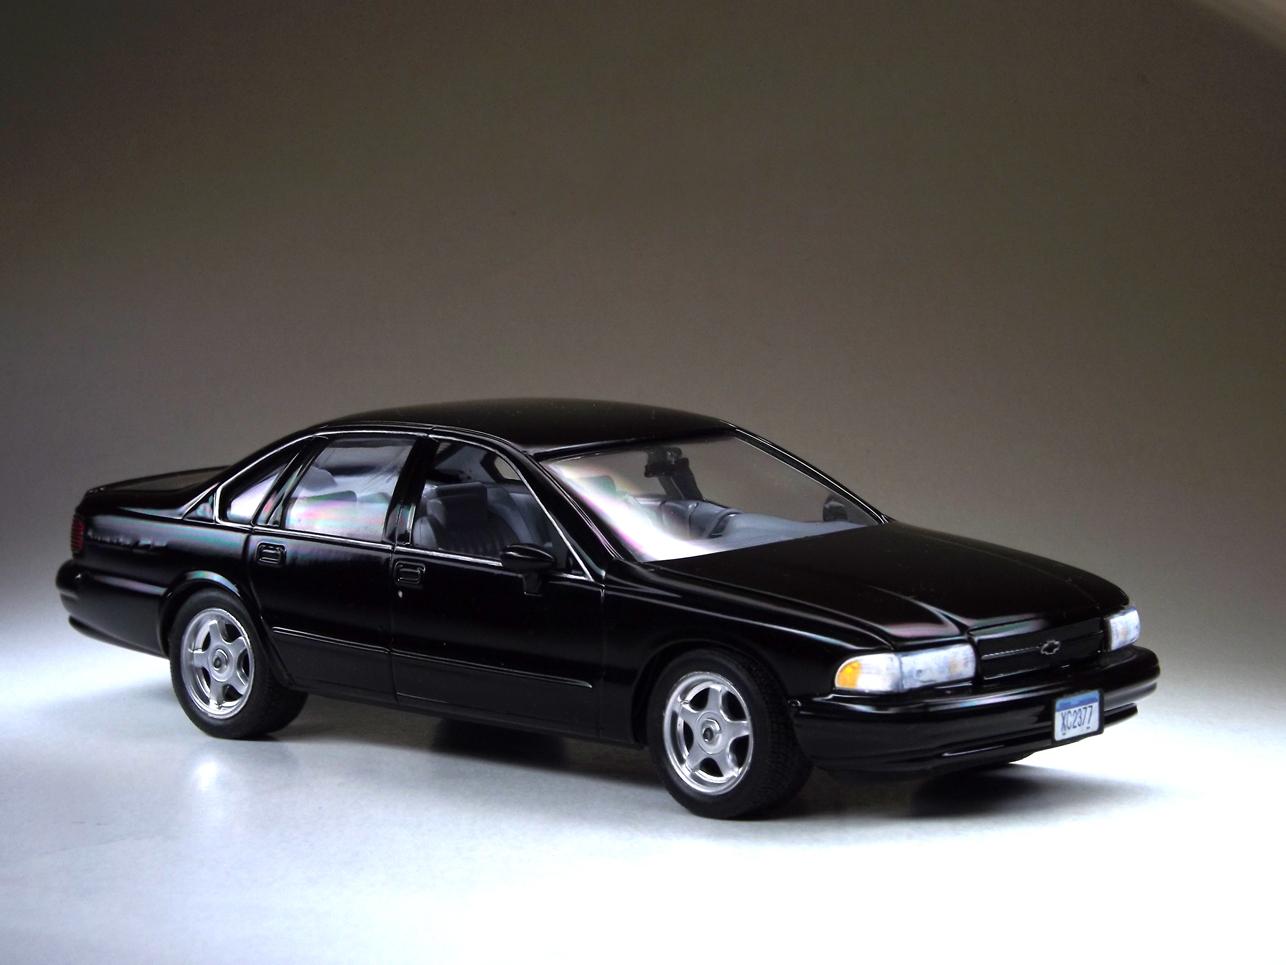 chevy impala ss 1994 garagem124. Black Bedroom Furniture Sets. Home Design Ideas